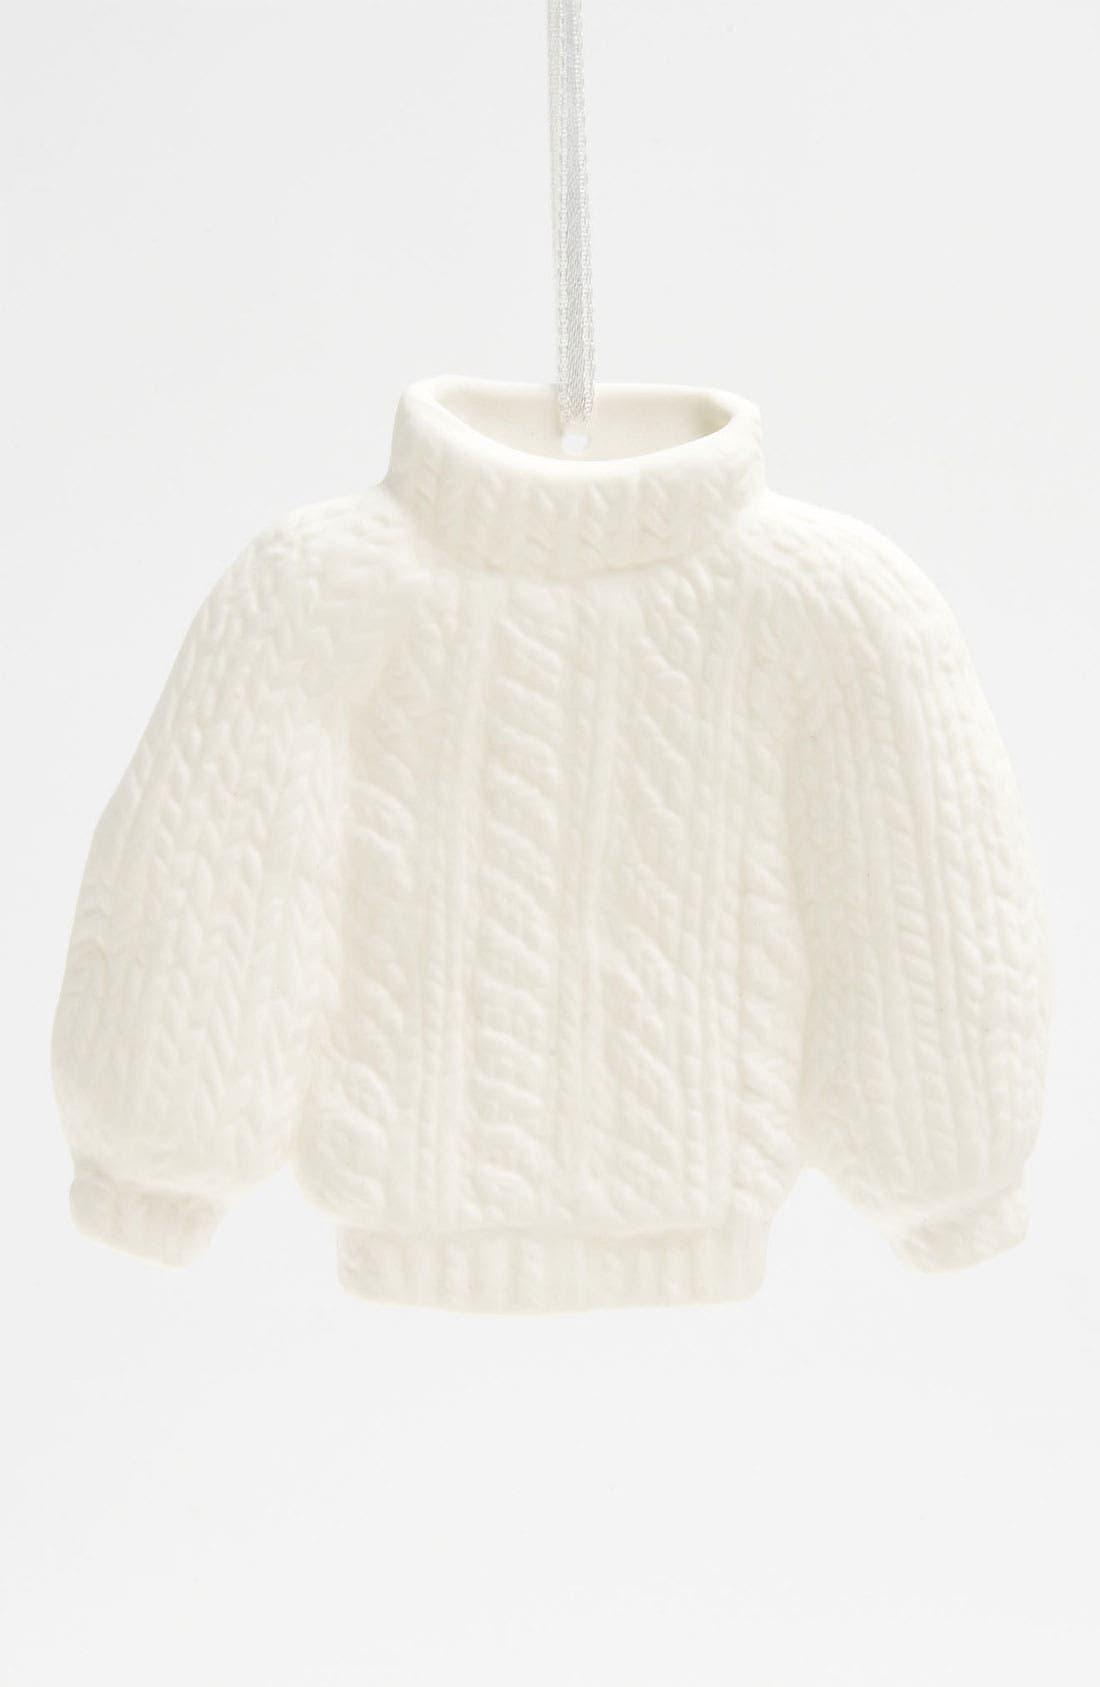 Alternate Image 1 Selected - CSM Philippines Inc. Sweater Ornament